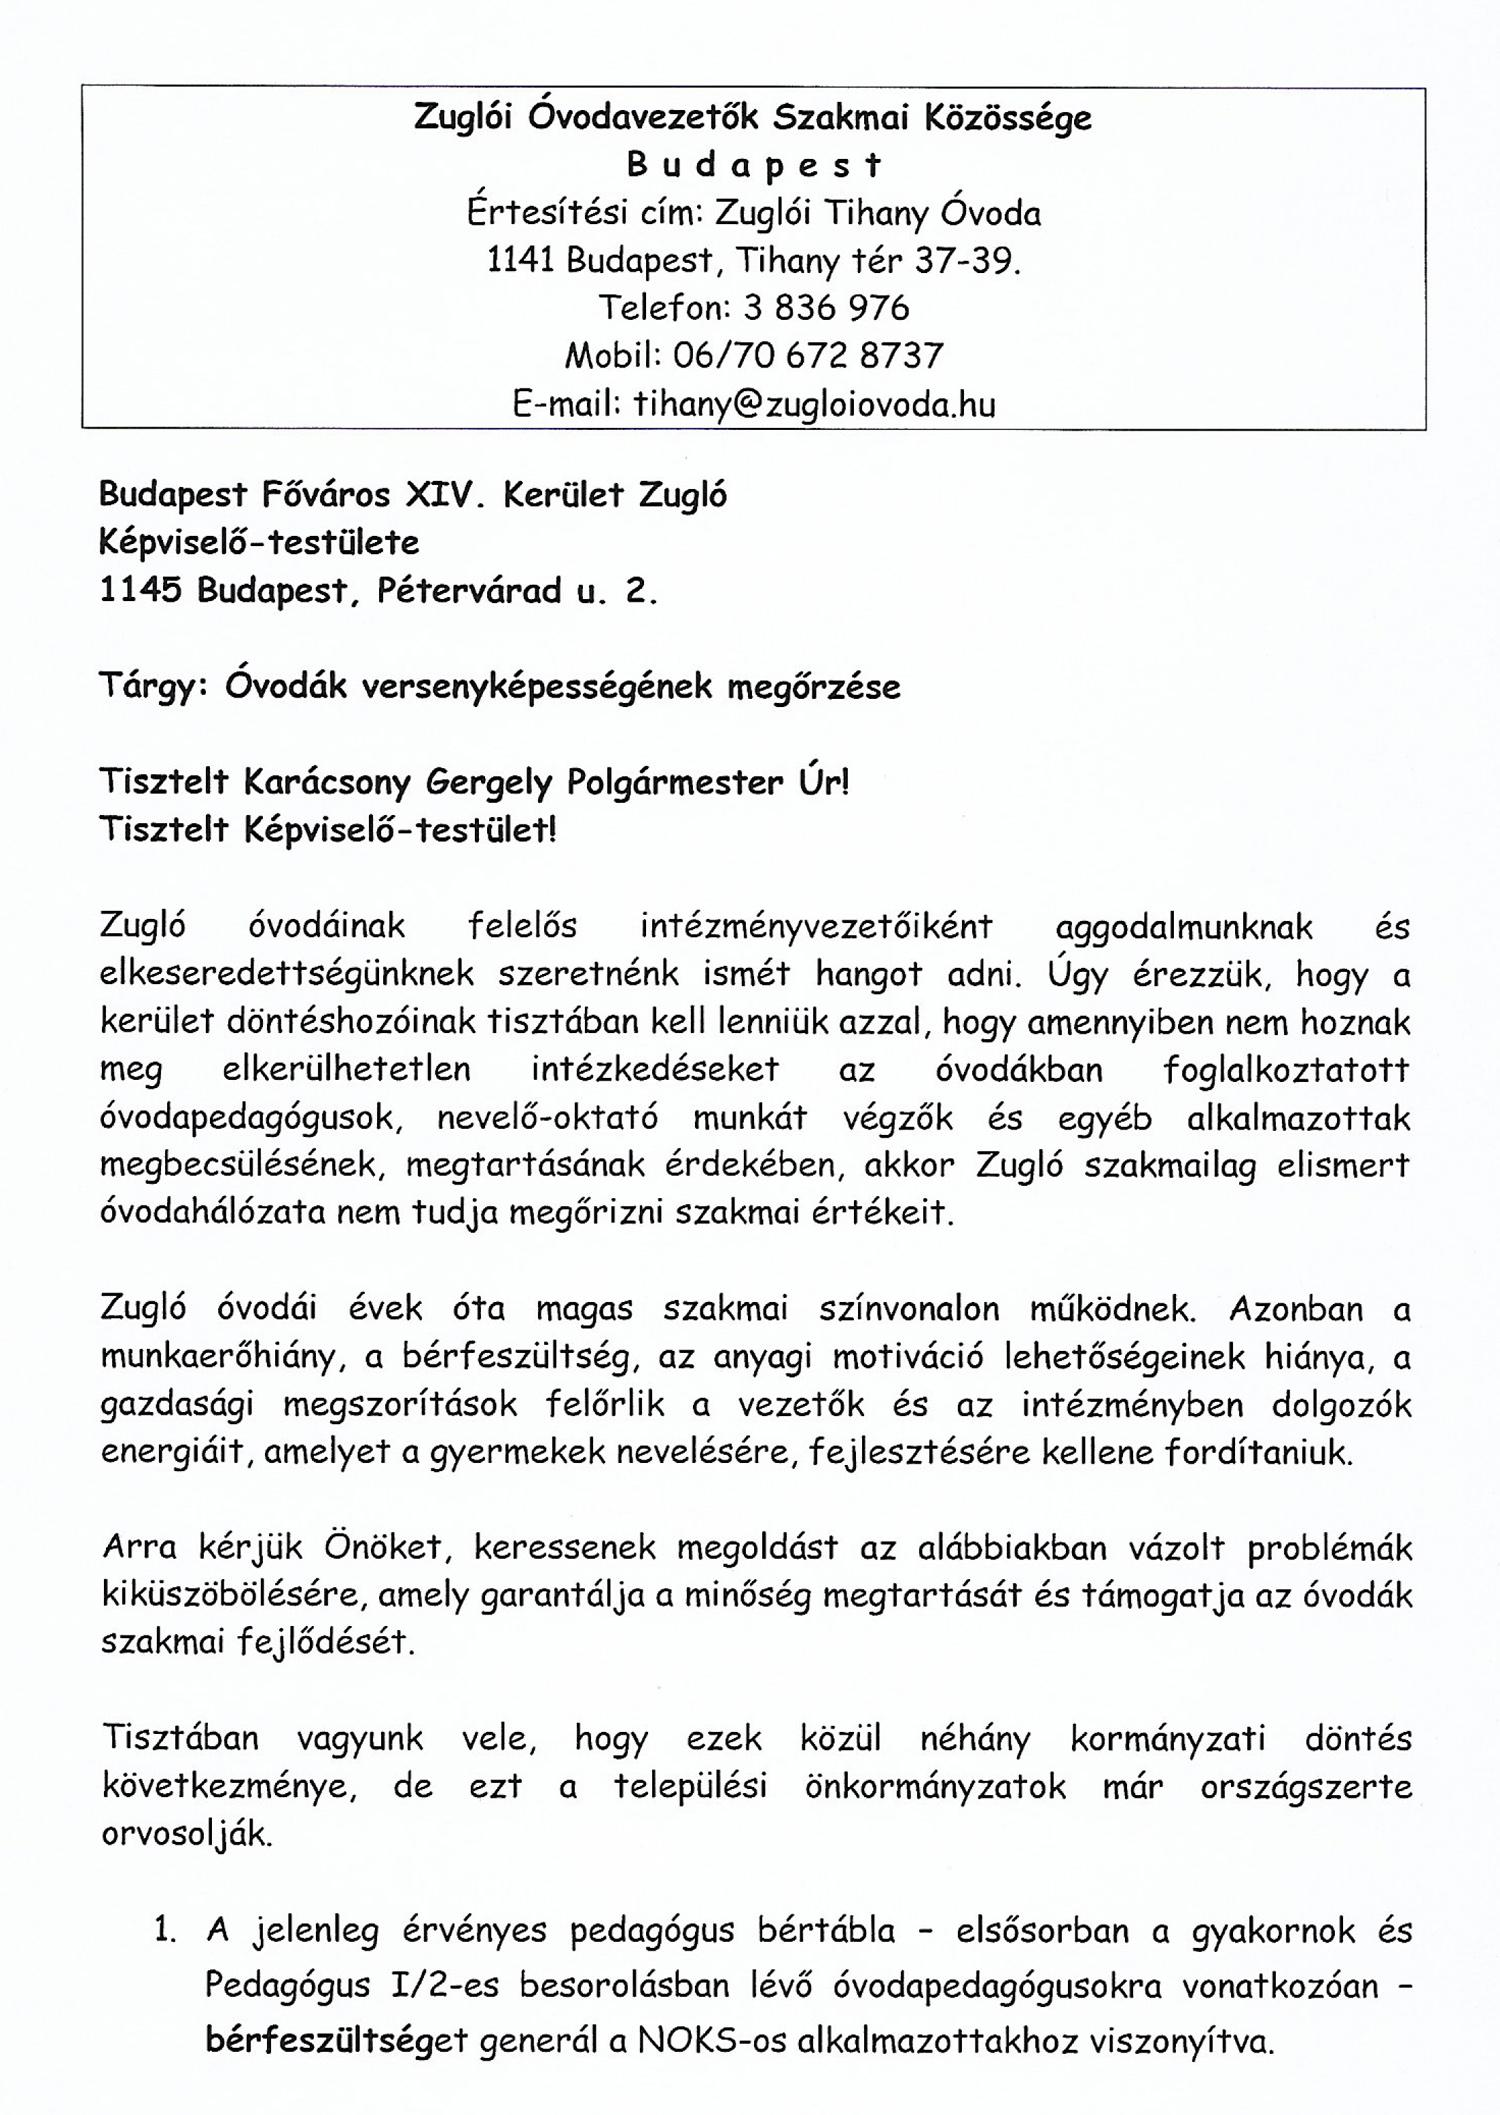 kepviselo-testuleti_level_zugloi_ovodak_20190227-1.jpg